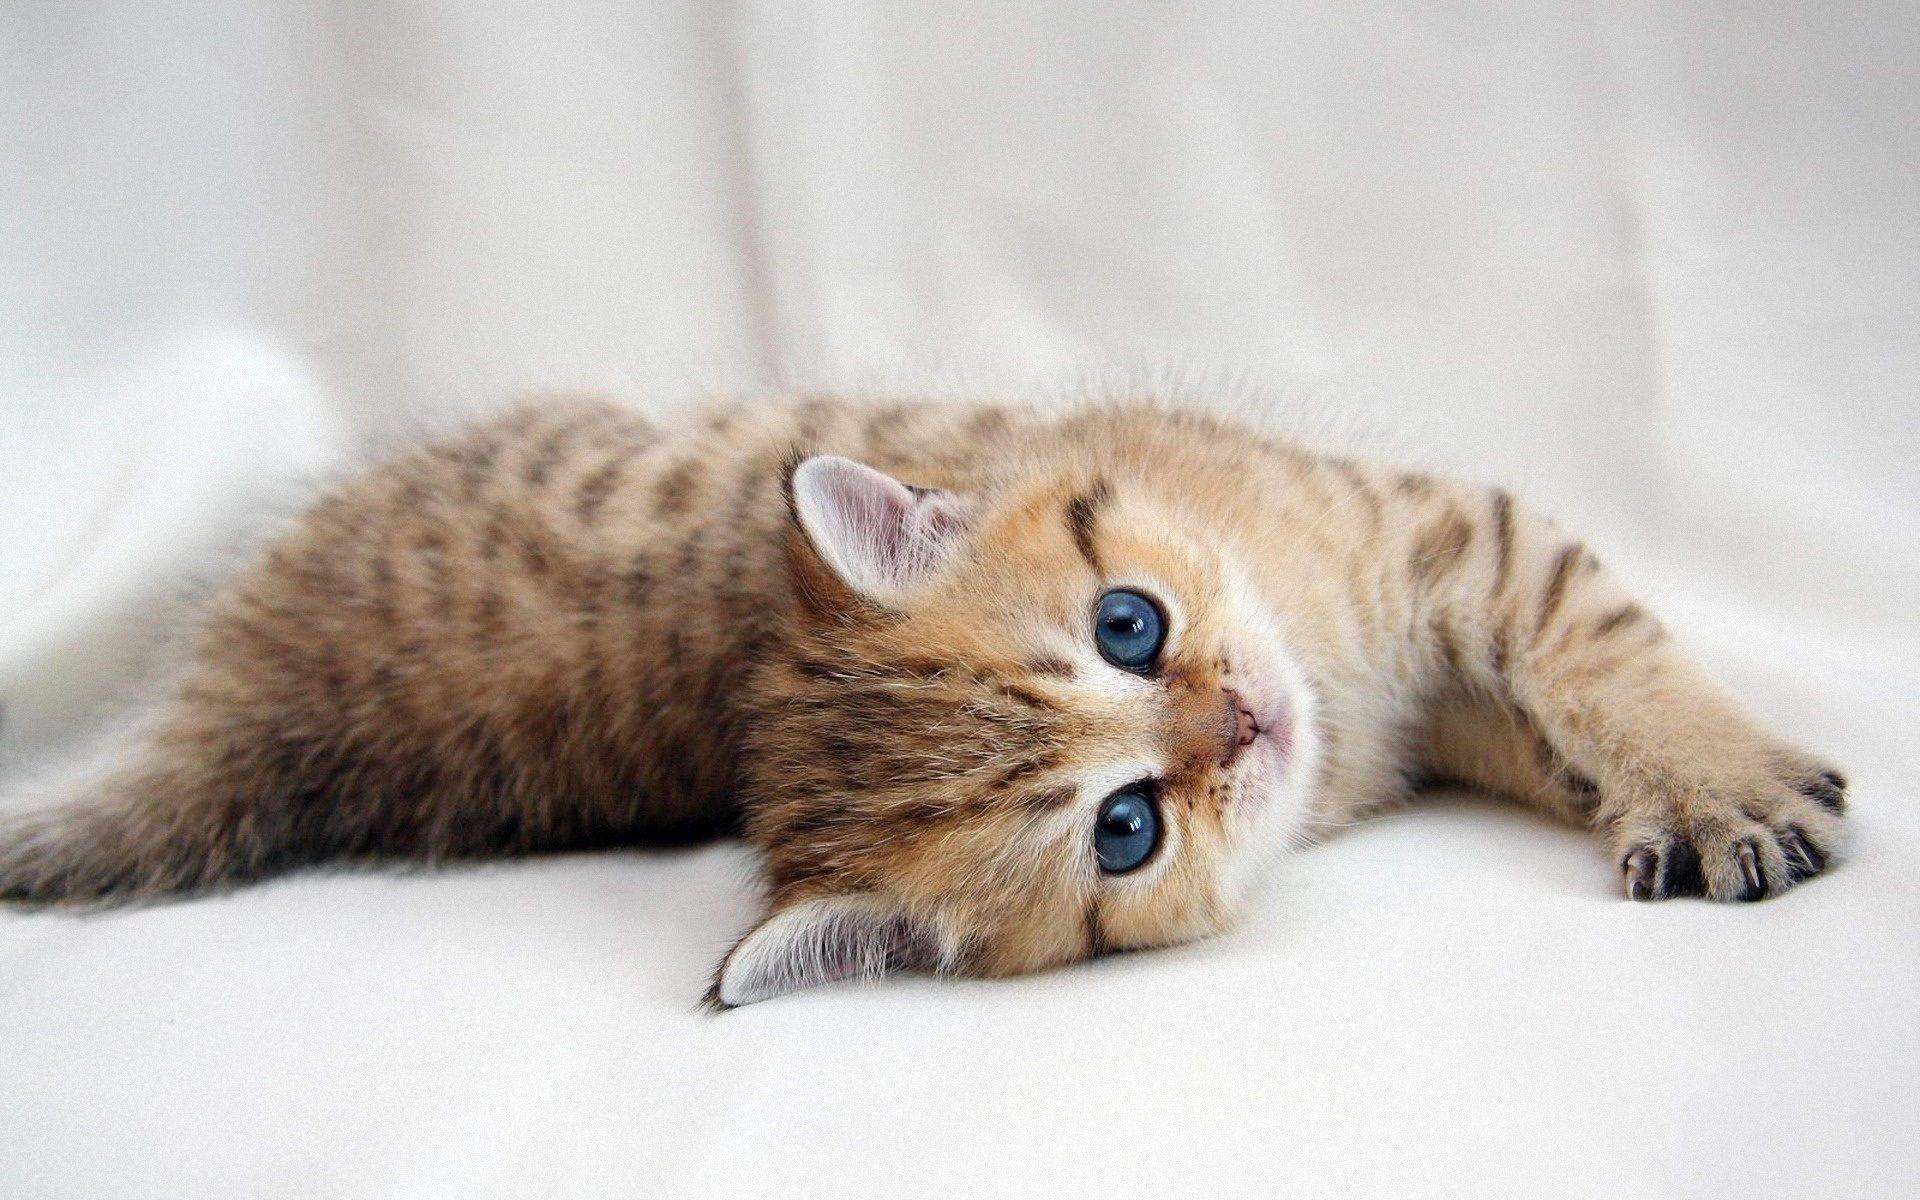 Fluffy Kitten Wallpapers Free Cute Cats Cute Cats And Kittens Fluffy Kittens